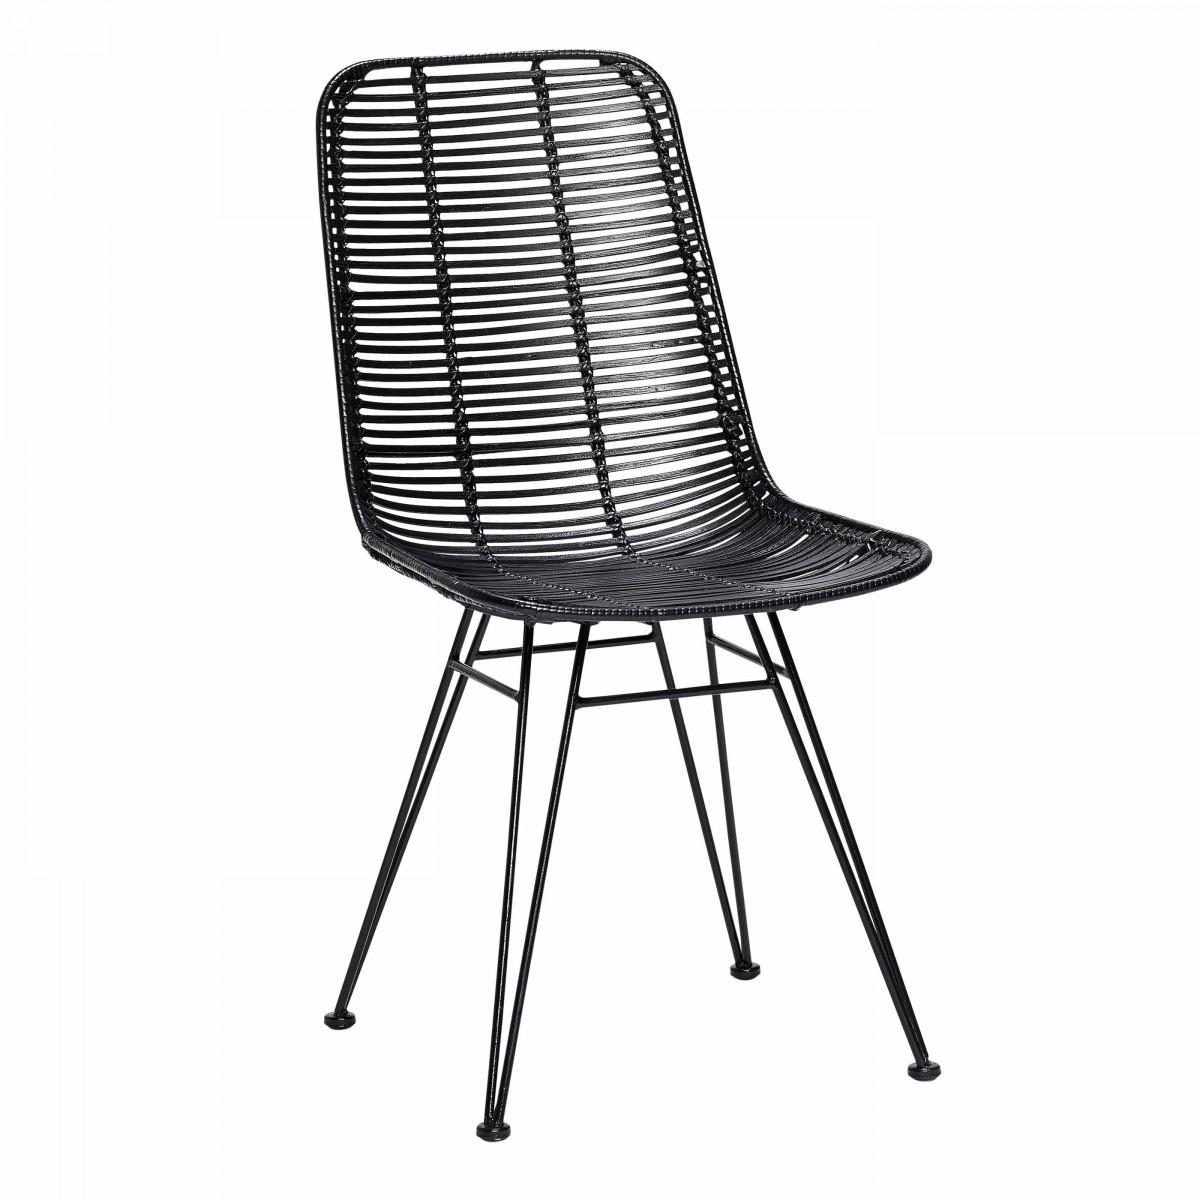 Chaise studio en rotin noir et pieds m tal h bsch for Chaise rotin moderne